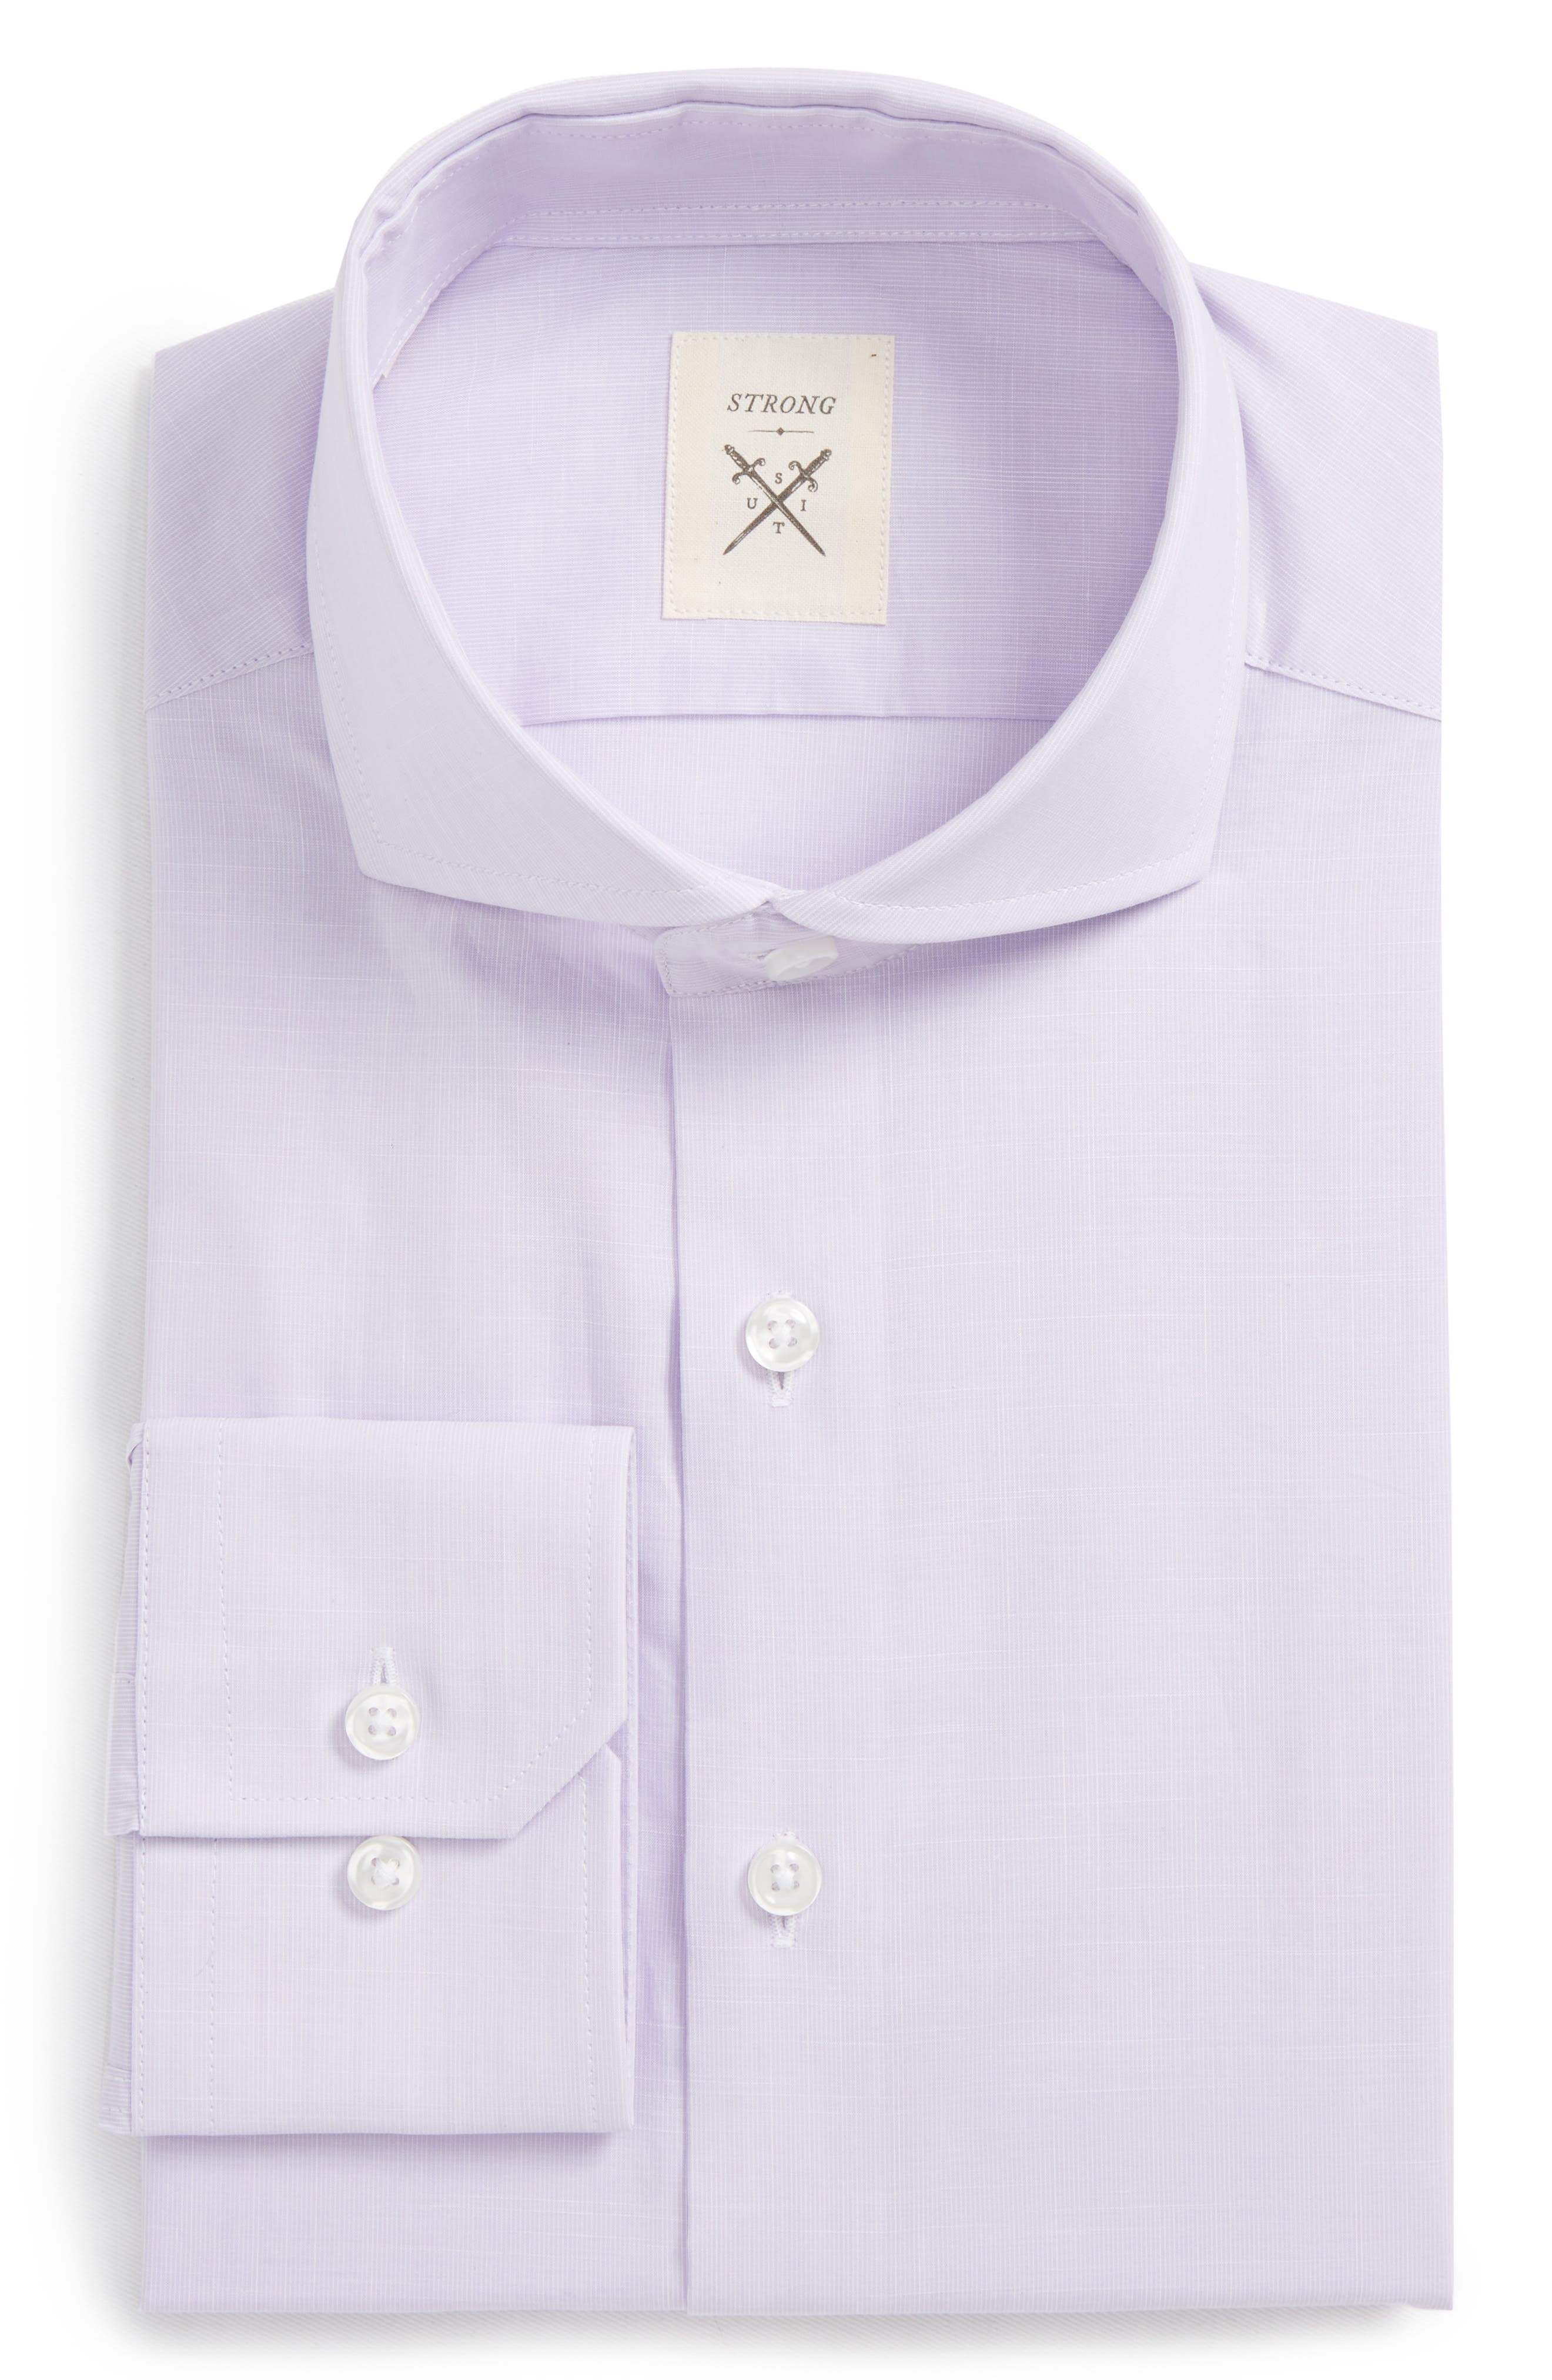 Espirit Trim Fit Solid Dress Shirt,                             Main thumbnail 1, color,                             Lavender Solid